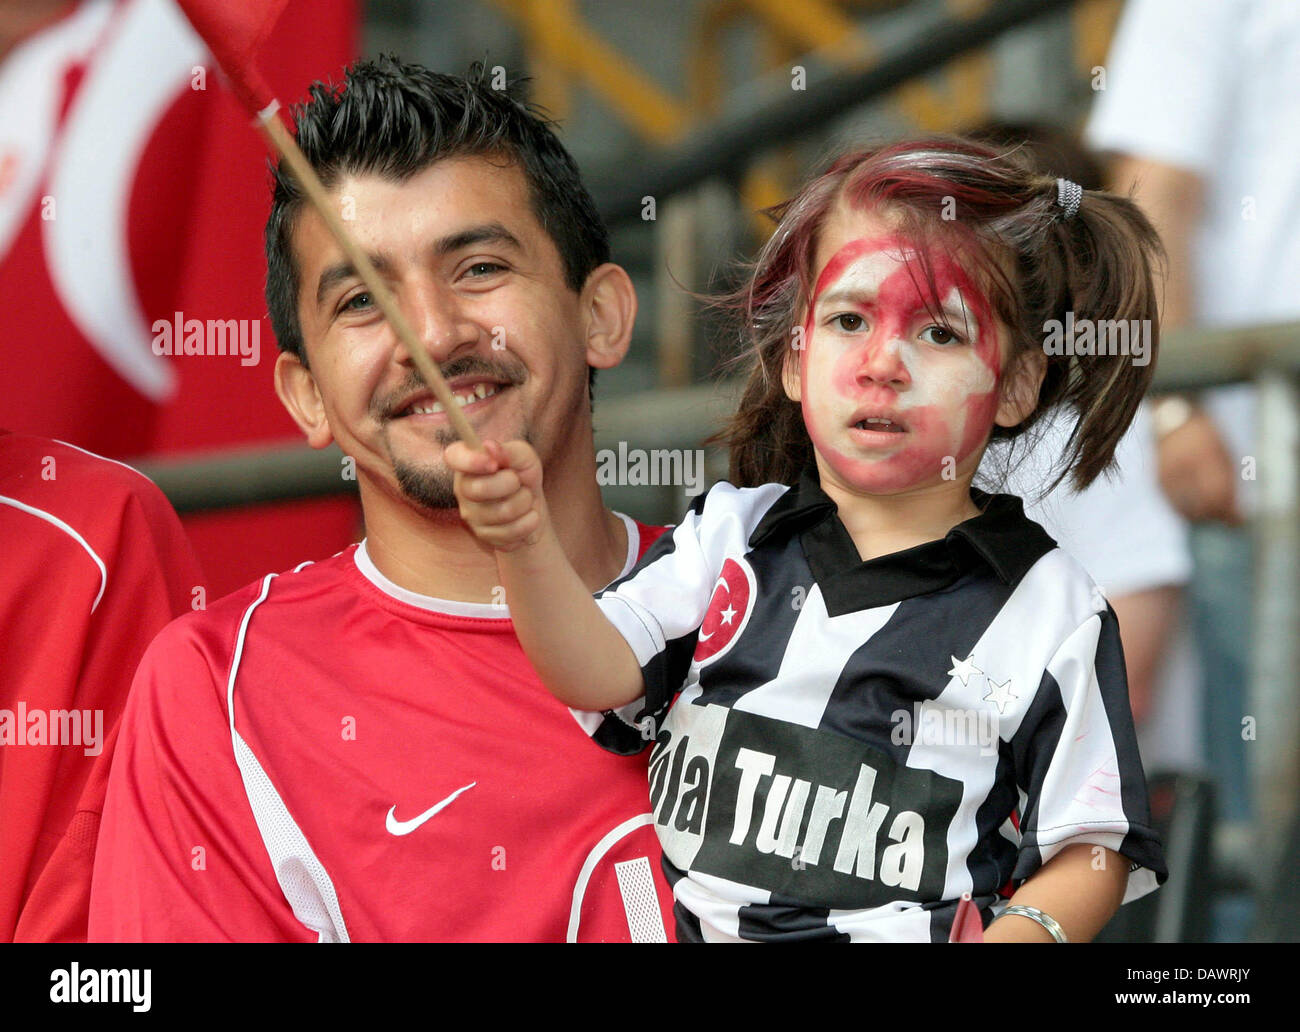 Turkish soccer devotees watch the friendly Brazil v Turkey at the Signal Iduna Park stadium of Dortmund, Germany, - Stock Image